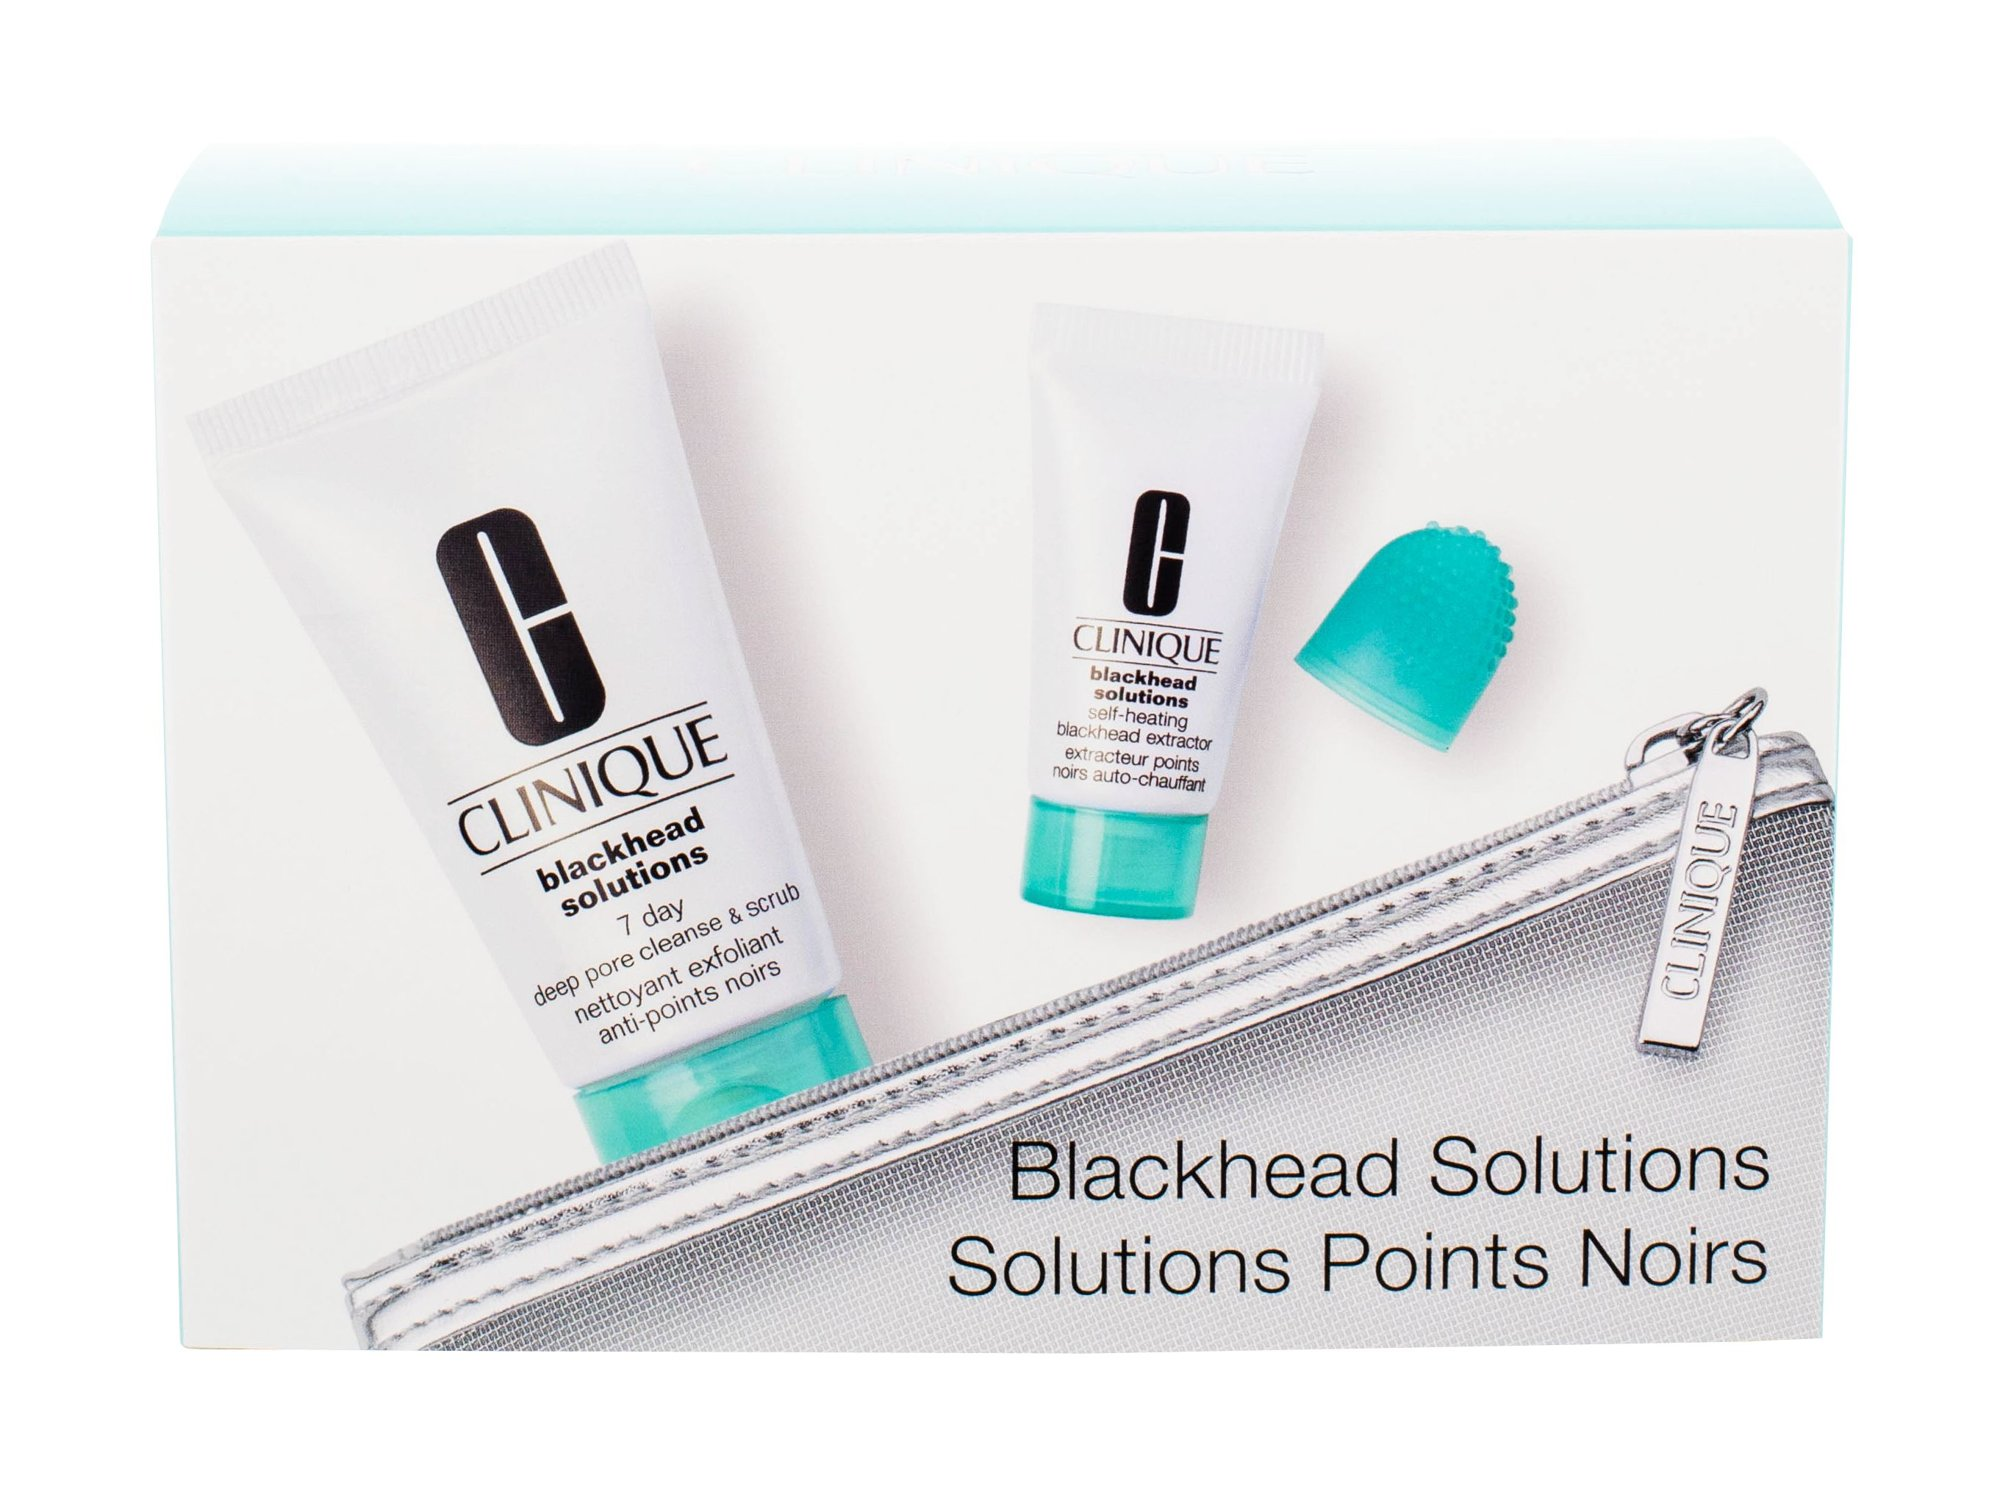 Clinique Blackhead Solutions Cleansing Gel 30ml